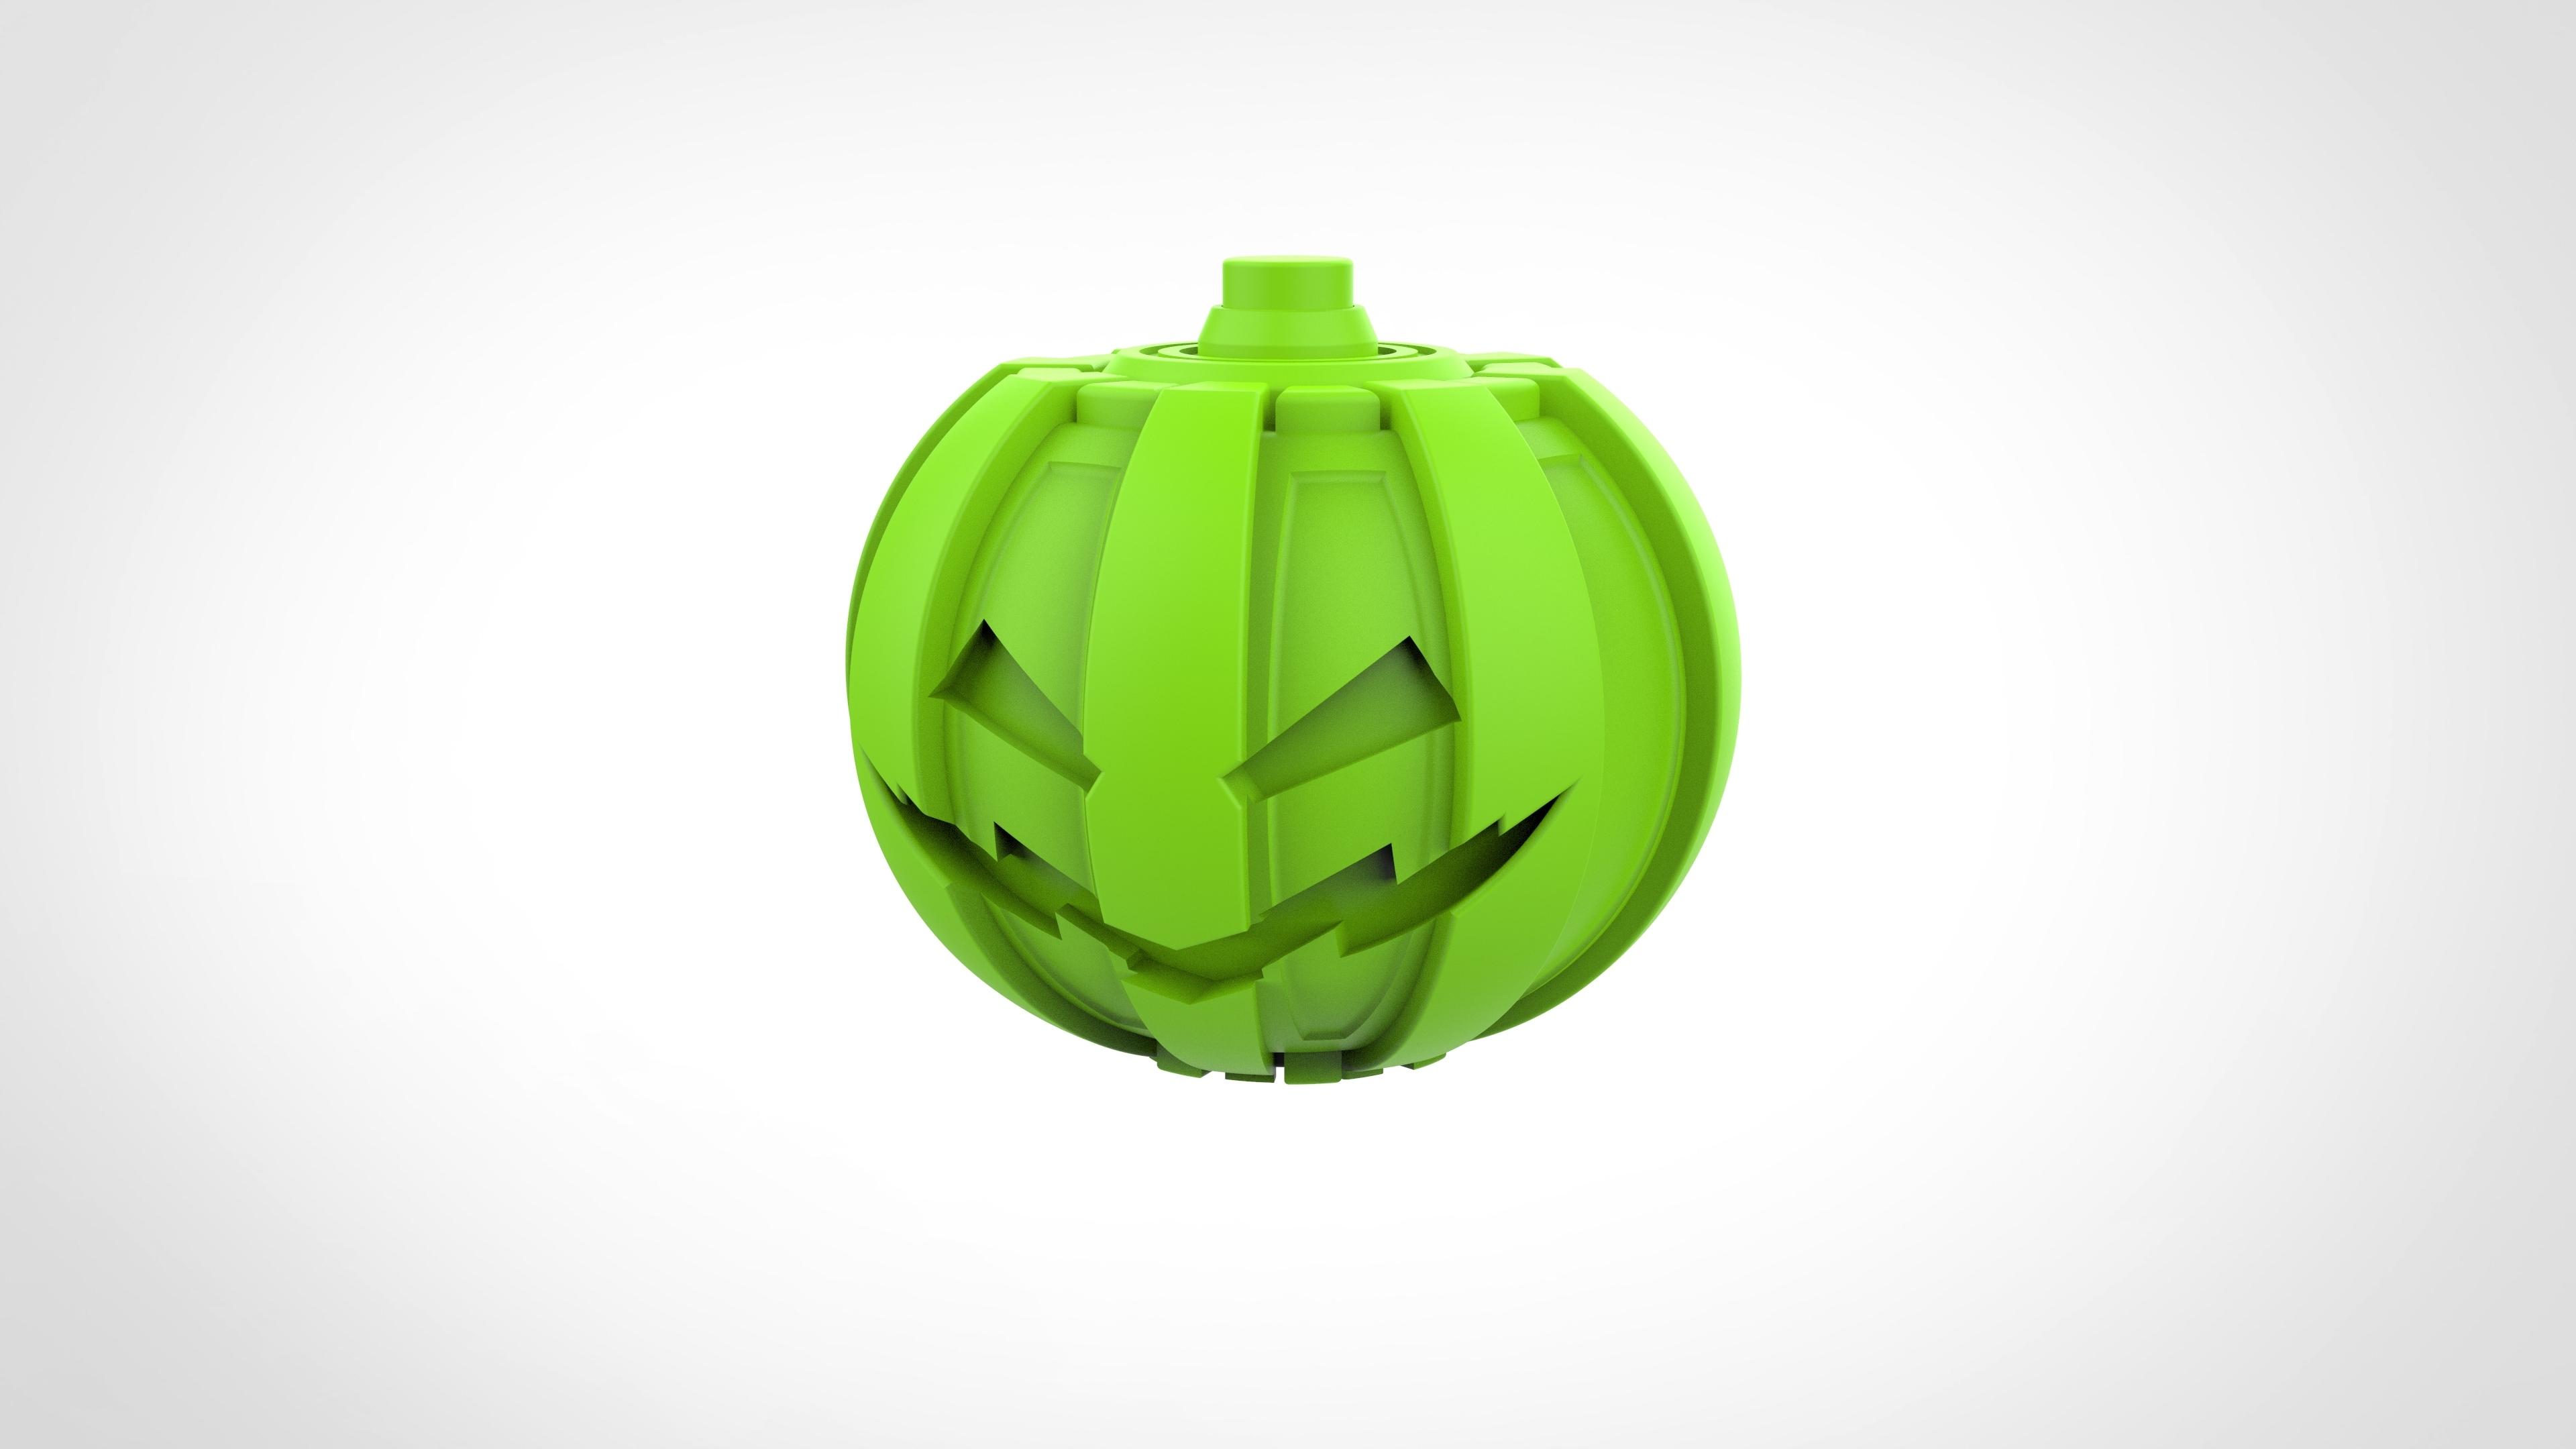 016.jpg Download 3MF file Green goblin bombs from the Spide-Man comics • 3D print model, vetrock